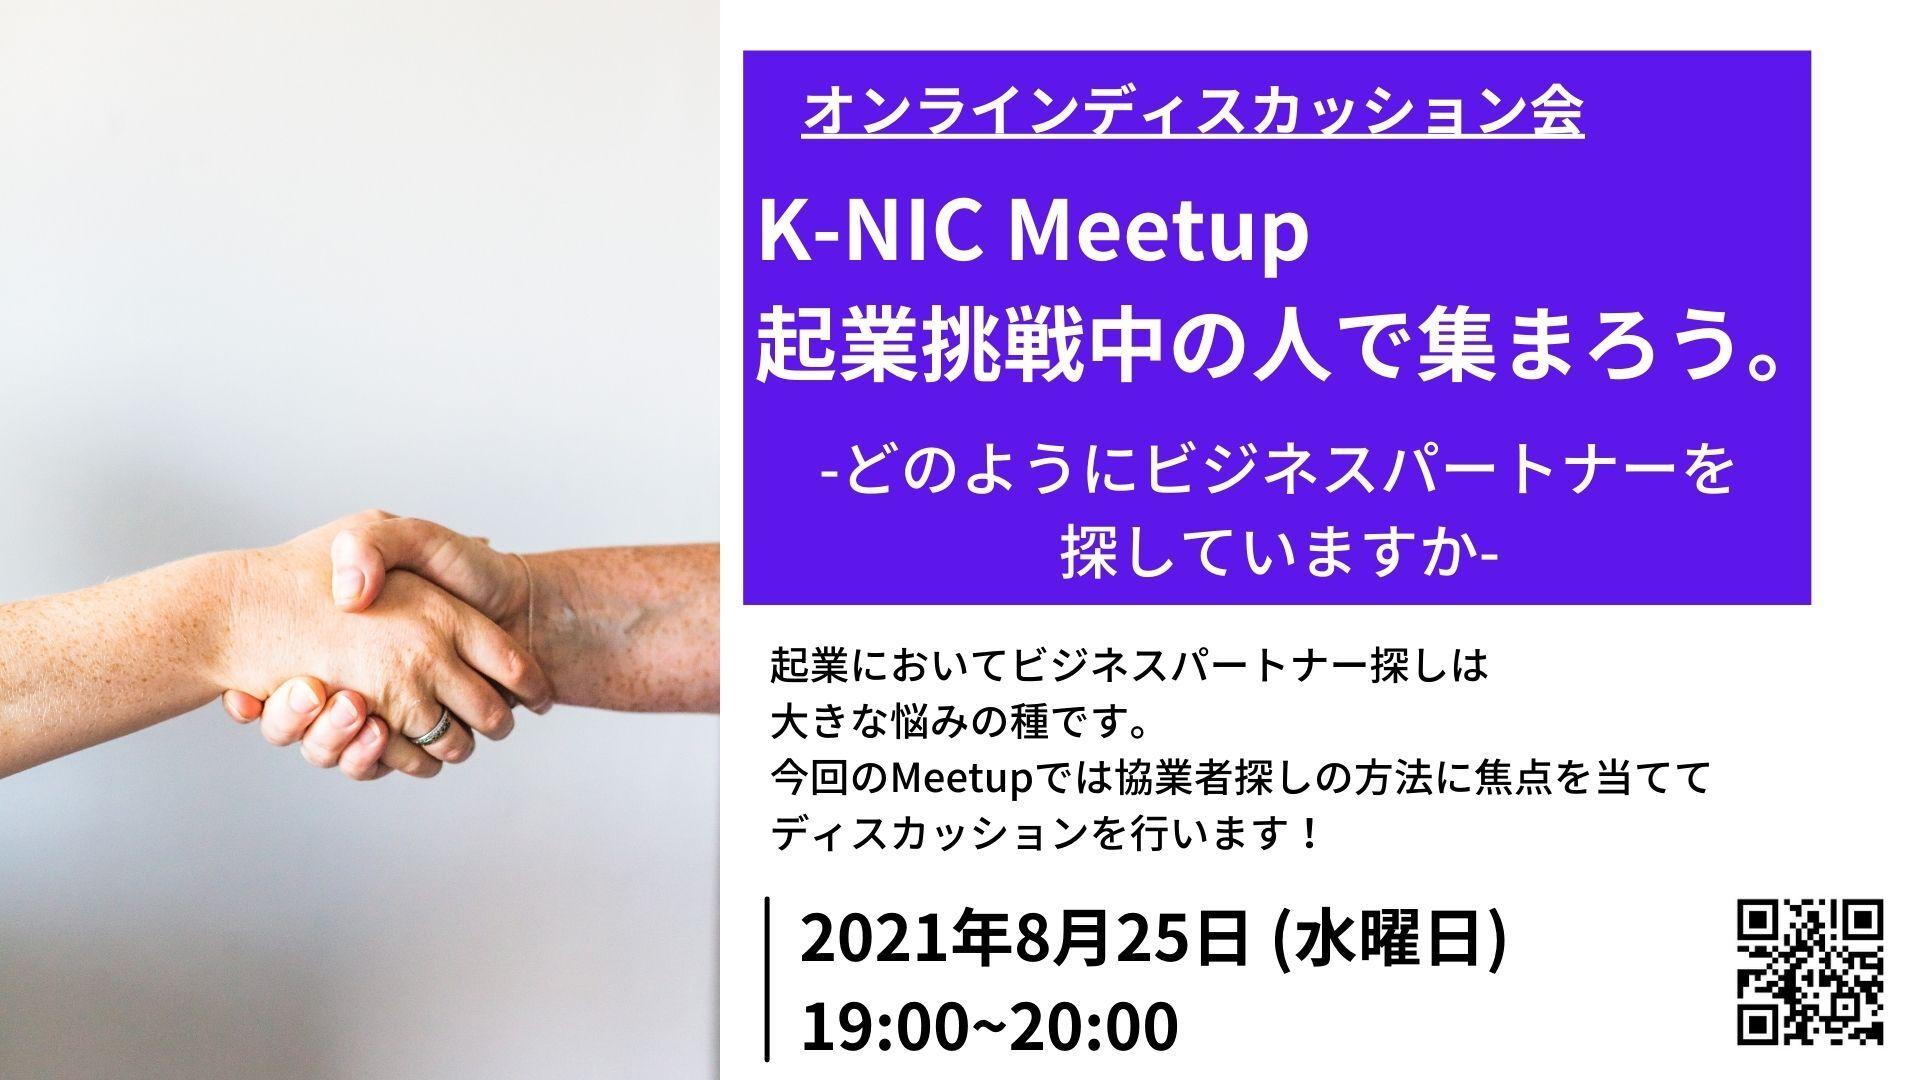 【8/25】K-NIC Meetup 起業挑戦中の人で集まろう